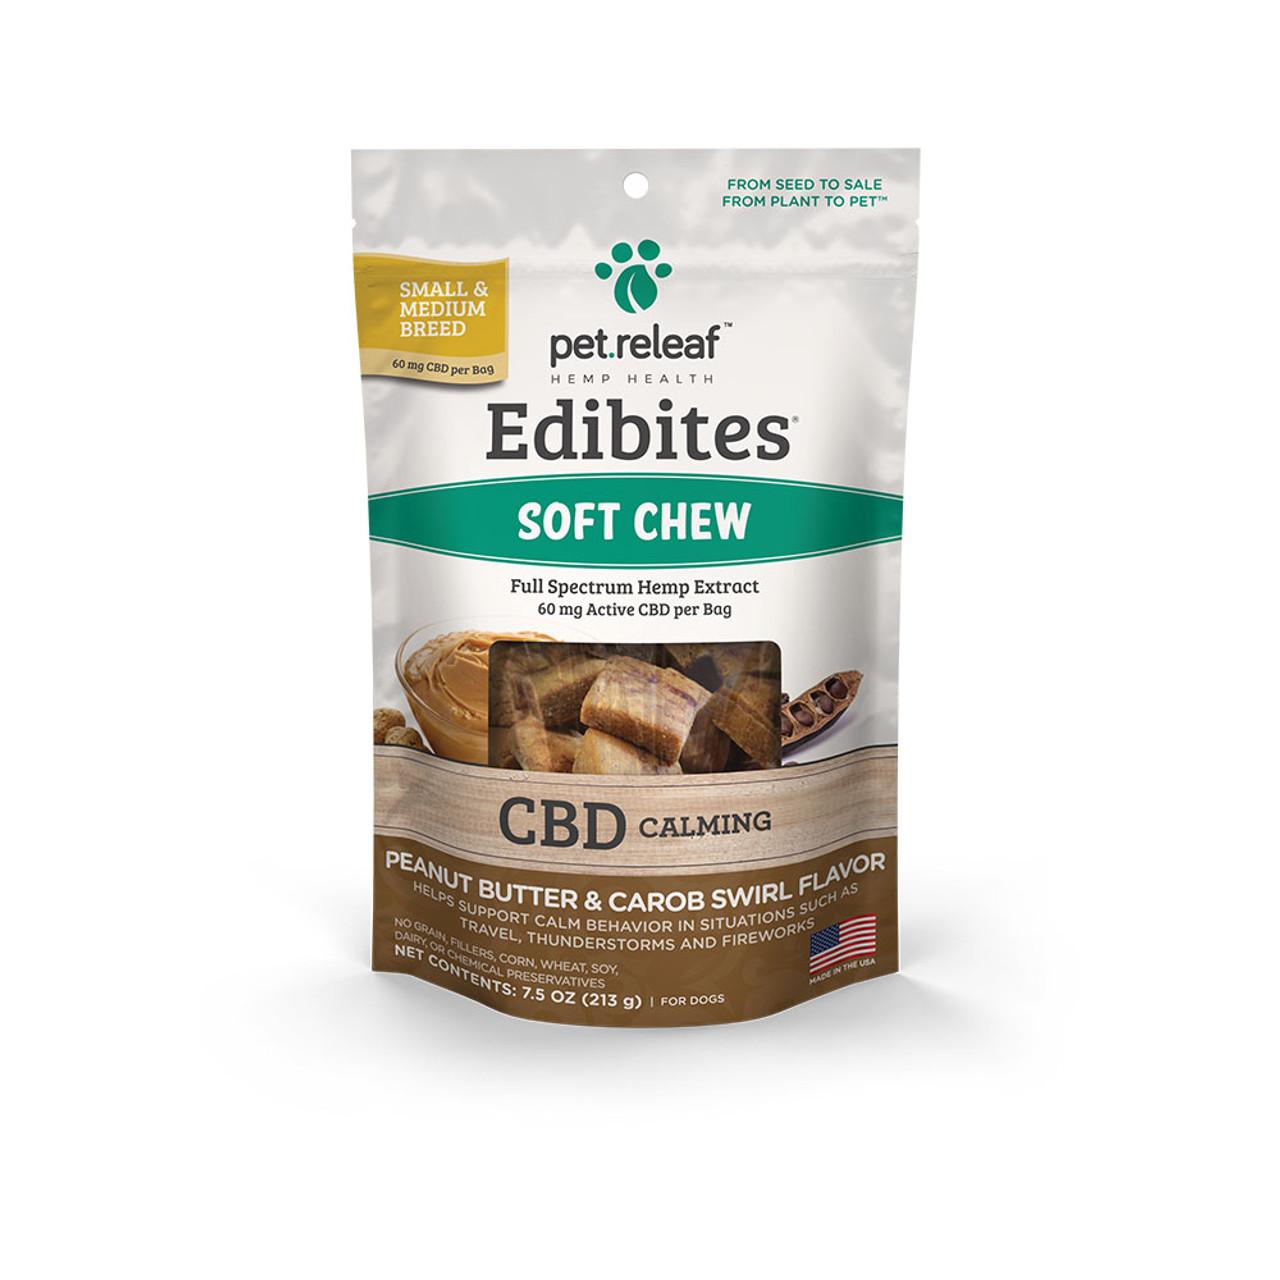 Pet Releaf Edibites Peanut Butter & Carob Swirl Soft Chew Hemp Dog Supplements -Front